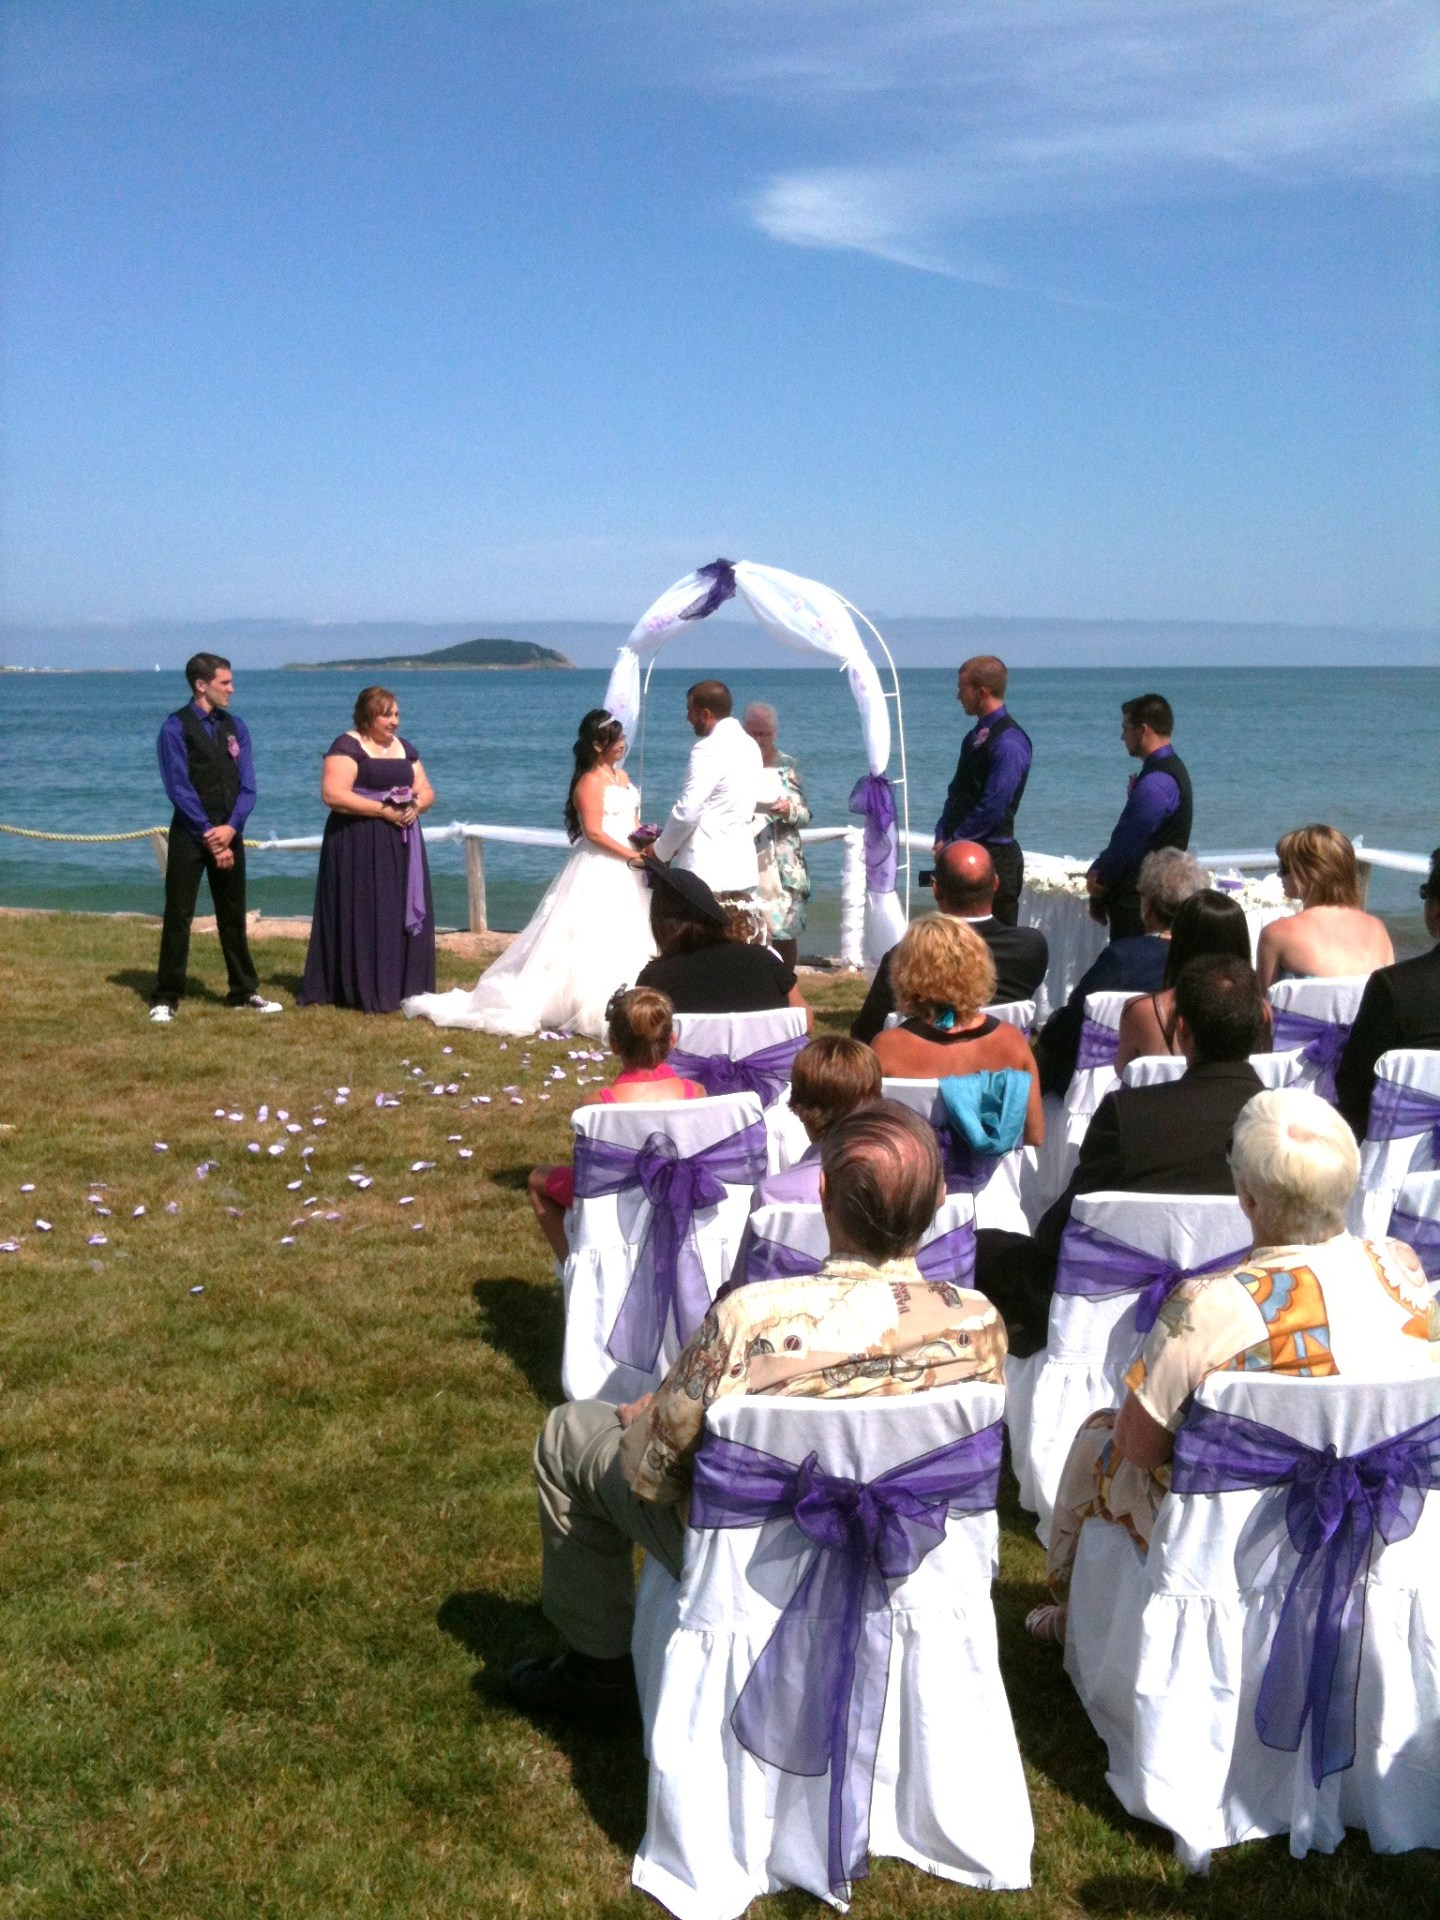 Wedding Ceremony by the Sea in Nova Scotia